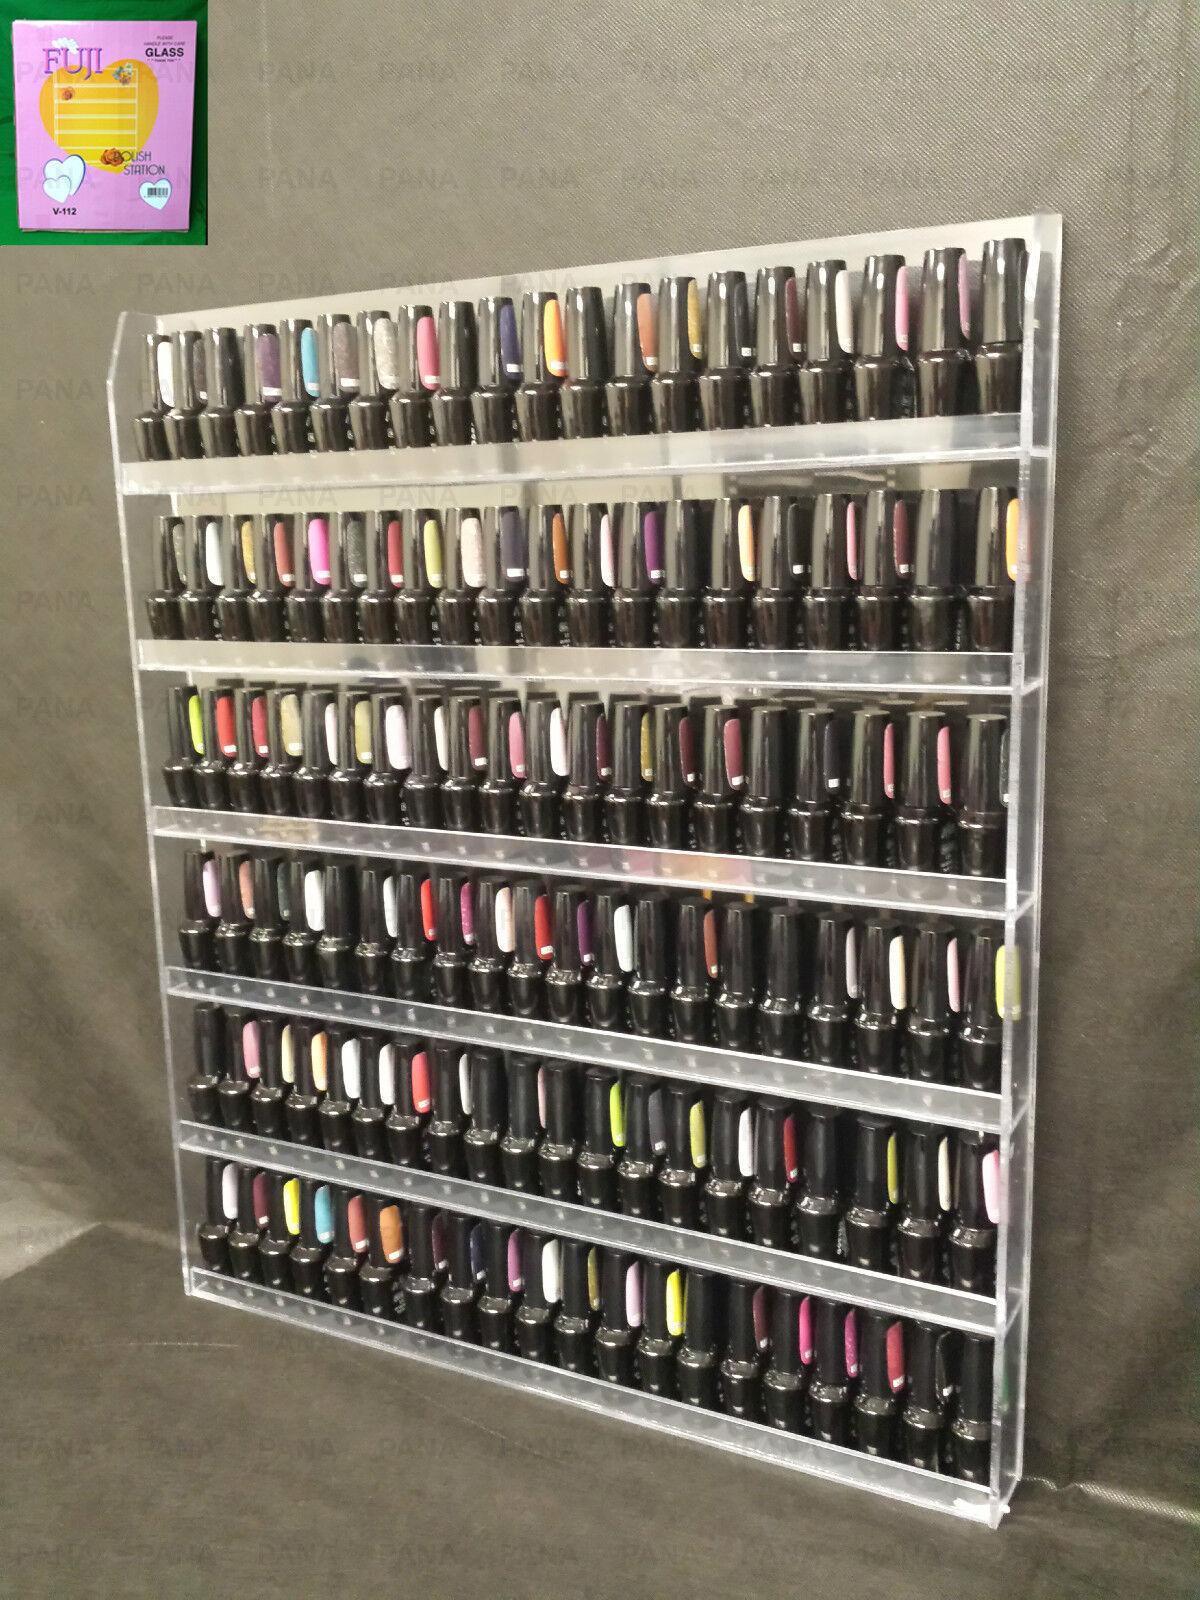 Uncategorized Nail Polish Wall Rack fuji nails acrylic nail polish wall rack organizer display ebay picture 1 of 11